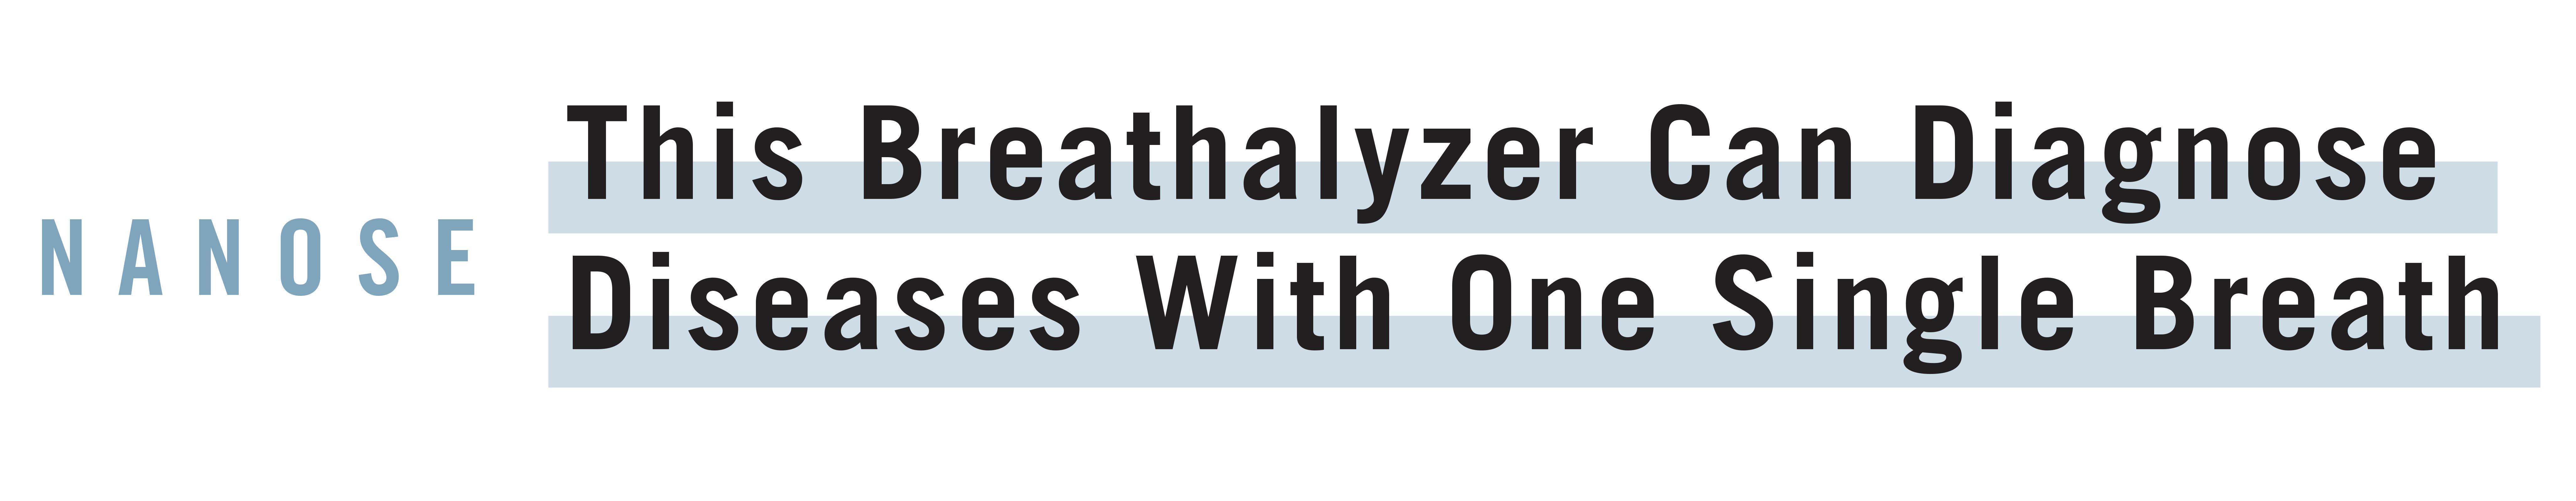 Breathalyzeer Device